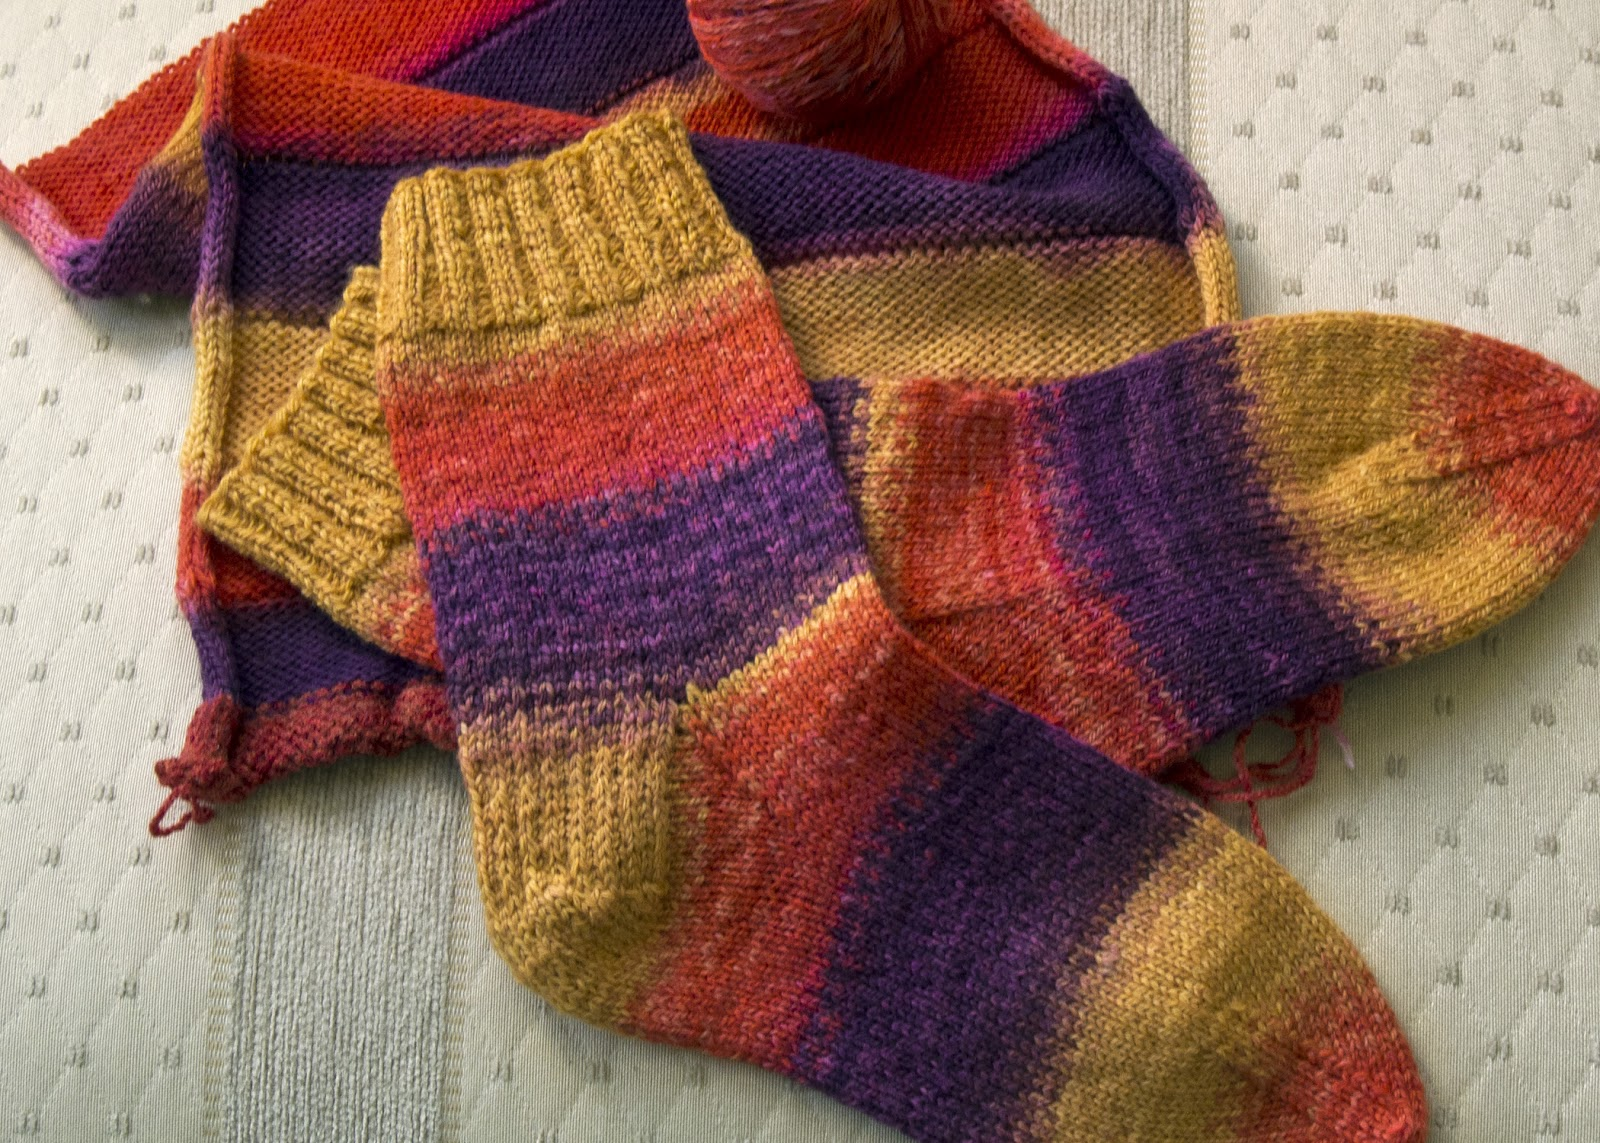 Knitting Nancy Machine : Weavespindance nancy roberts knitting to dye for ii